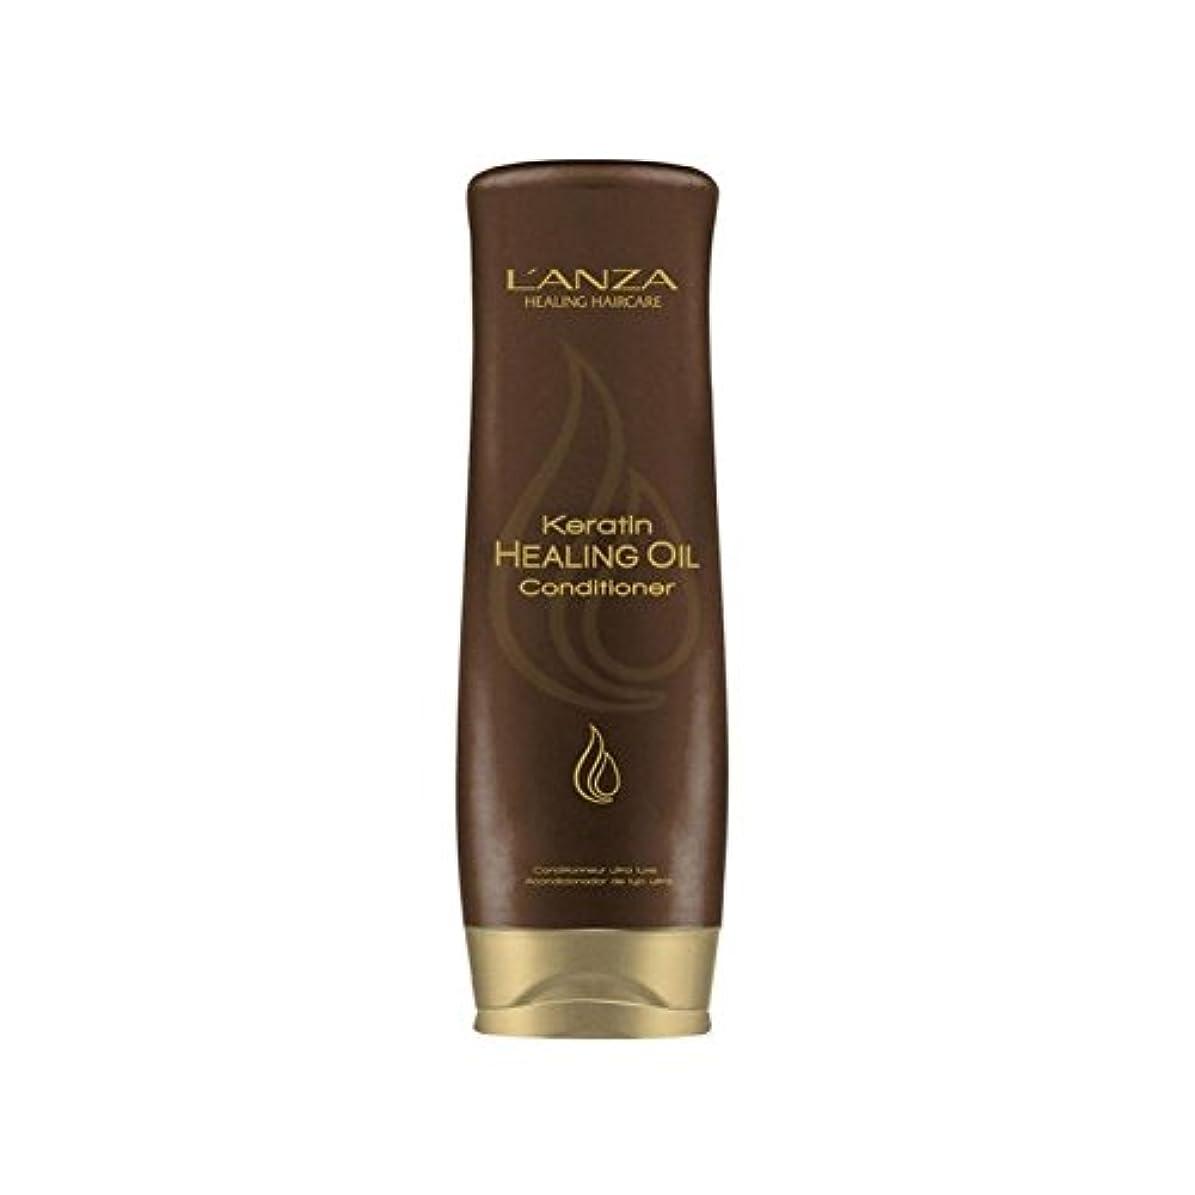 L'Anza Keratin Healing Oil Conditioner (250ml) (Pack of 6) - アンザケラチンオイルコンディショナー(250ミリリットル)を癒し x6 [並行輸入品]